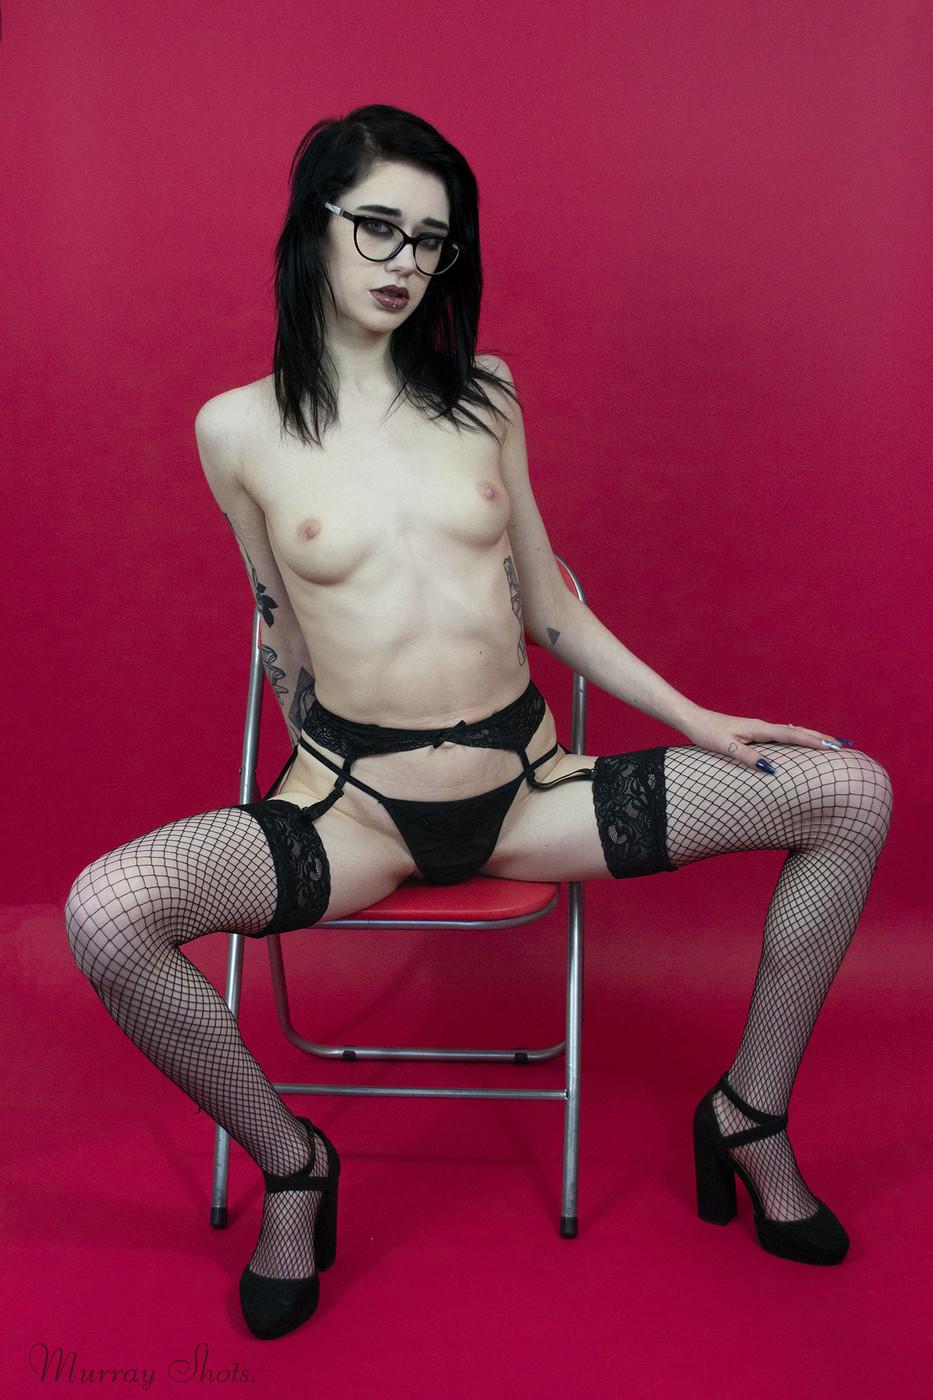 wife panties after date caption hot girls wallpaper